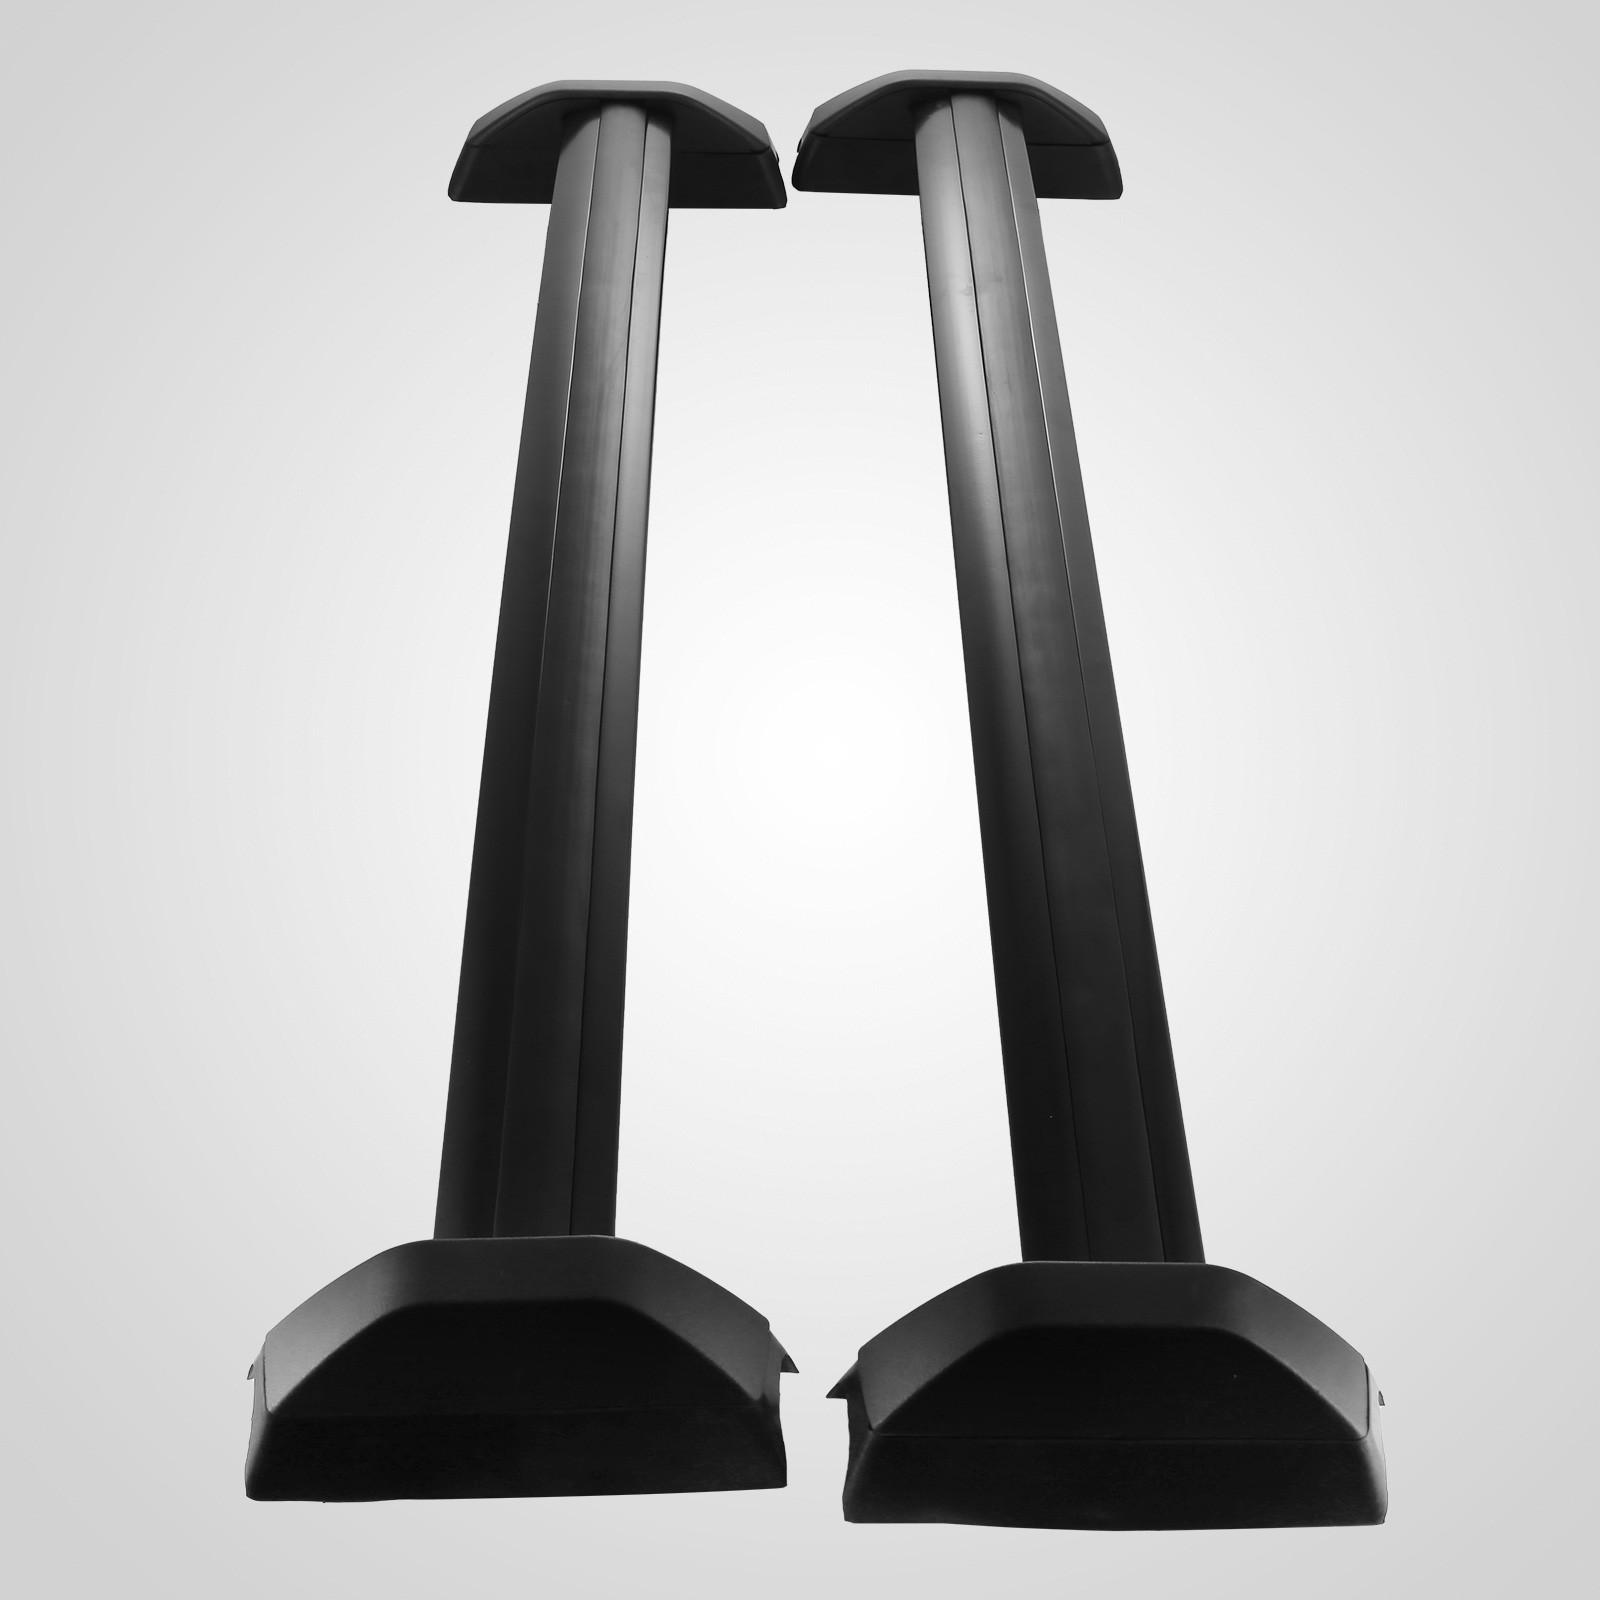 honda crv roof rack cross bar black luggage carrier set ebay